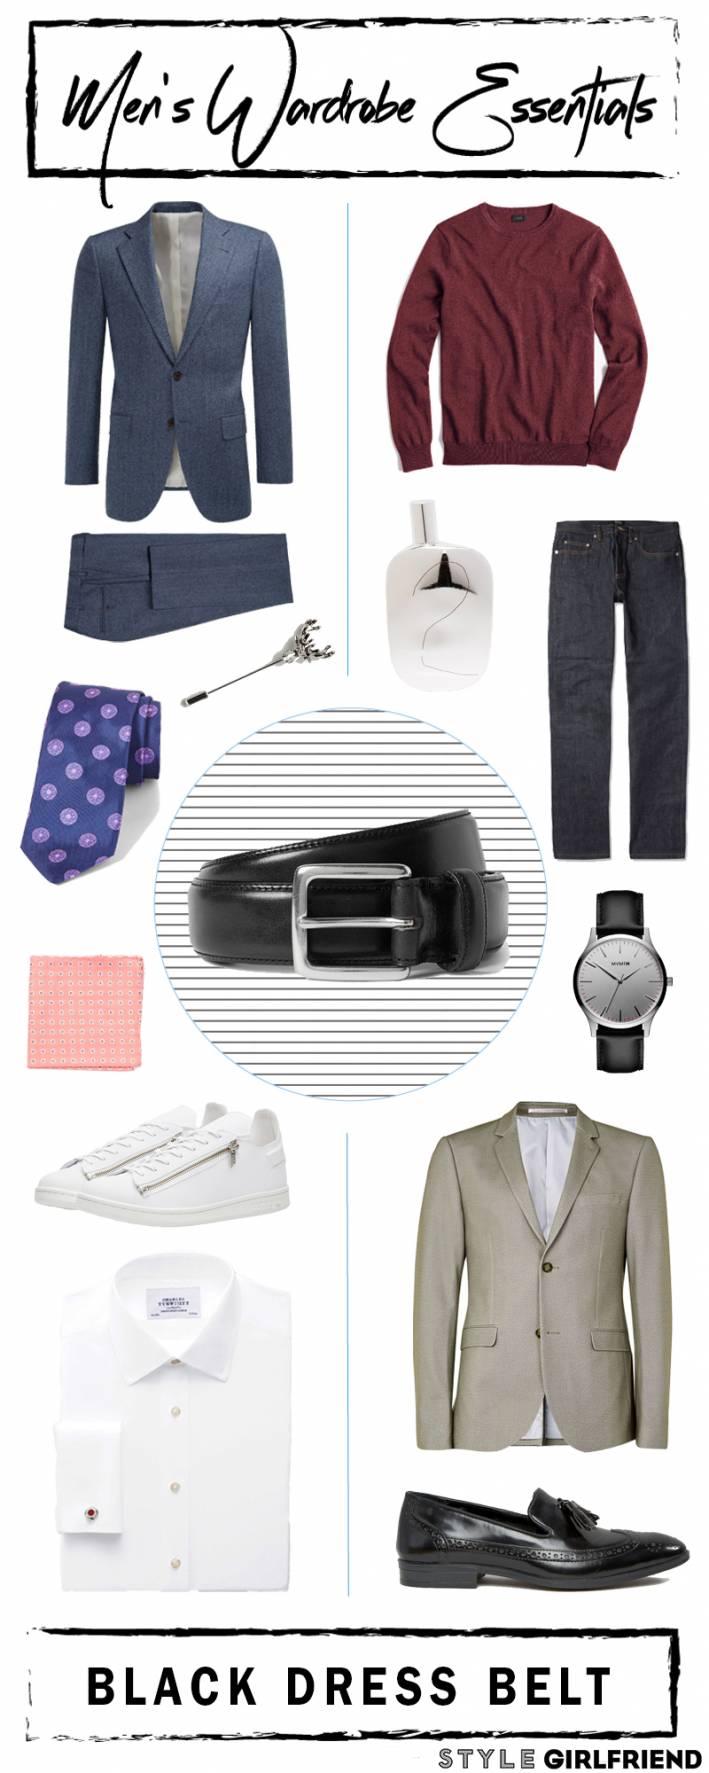 black dress belt, black belt, dress belt, men's wardrobe essentials, men's wardrobe essentials black dress belt, men's style, men's fashion, menswear